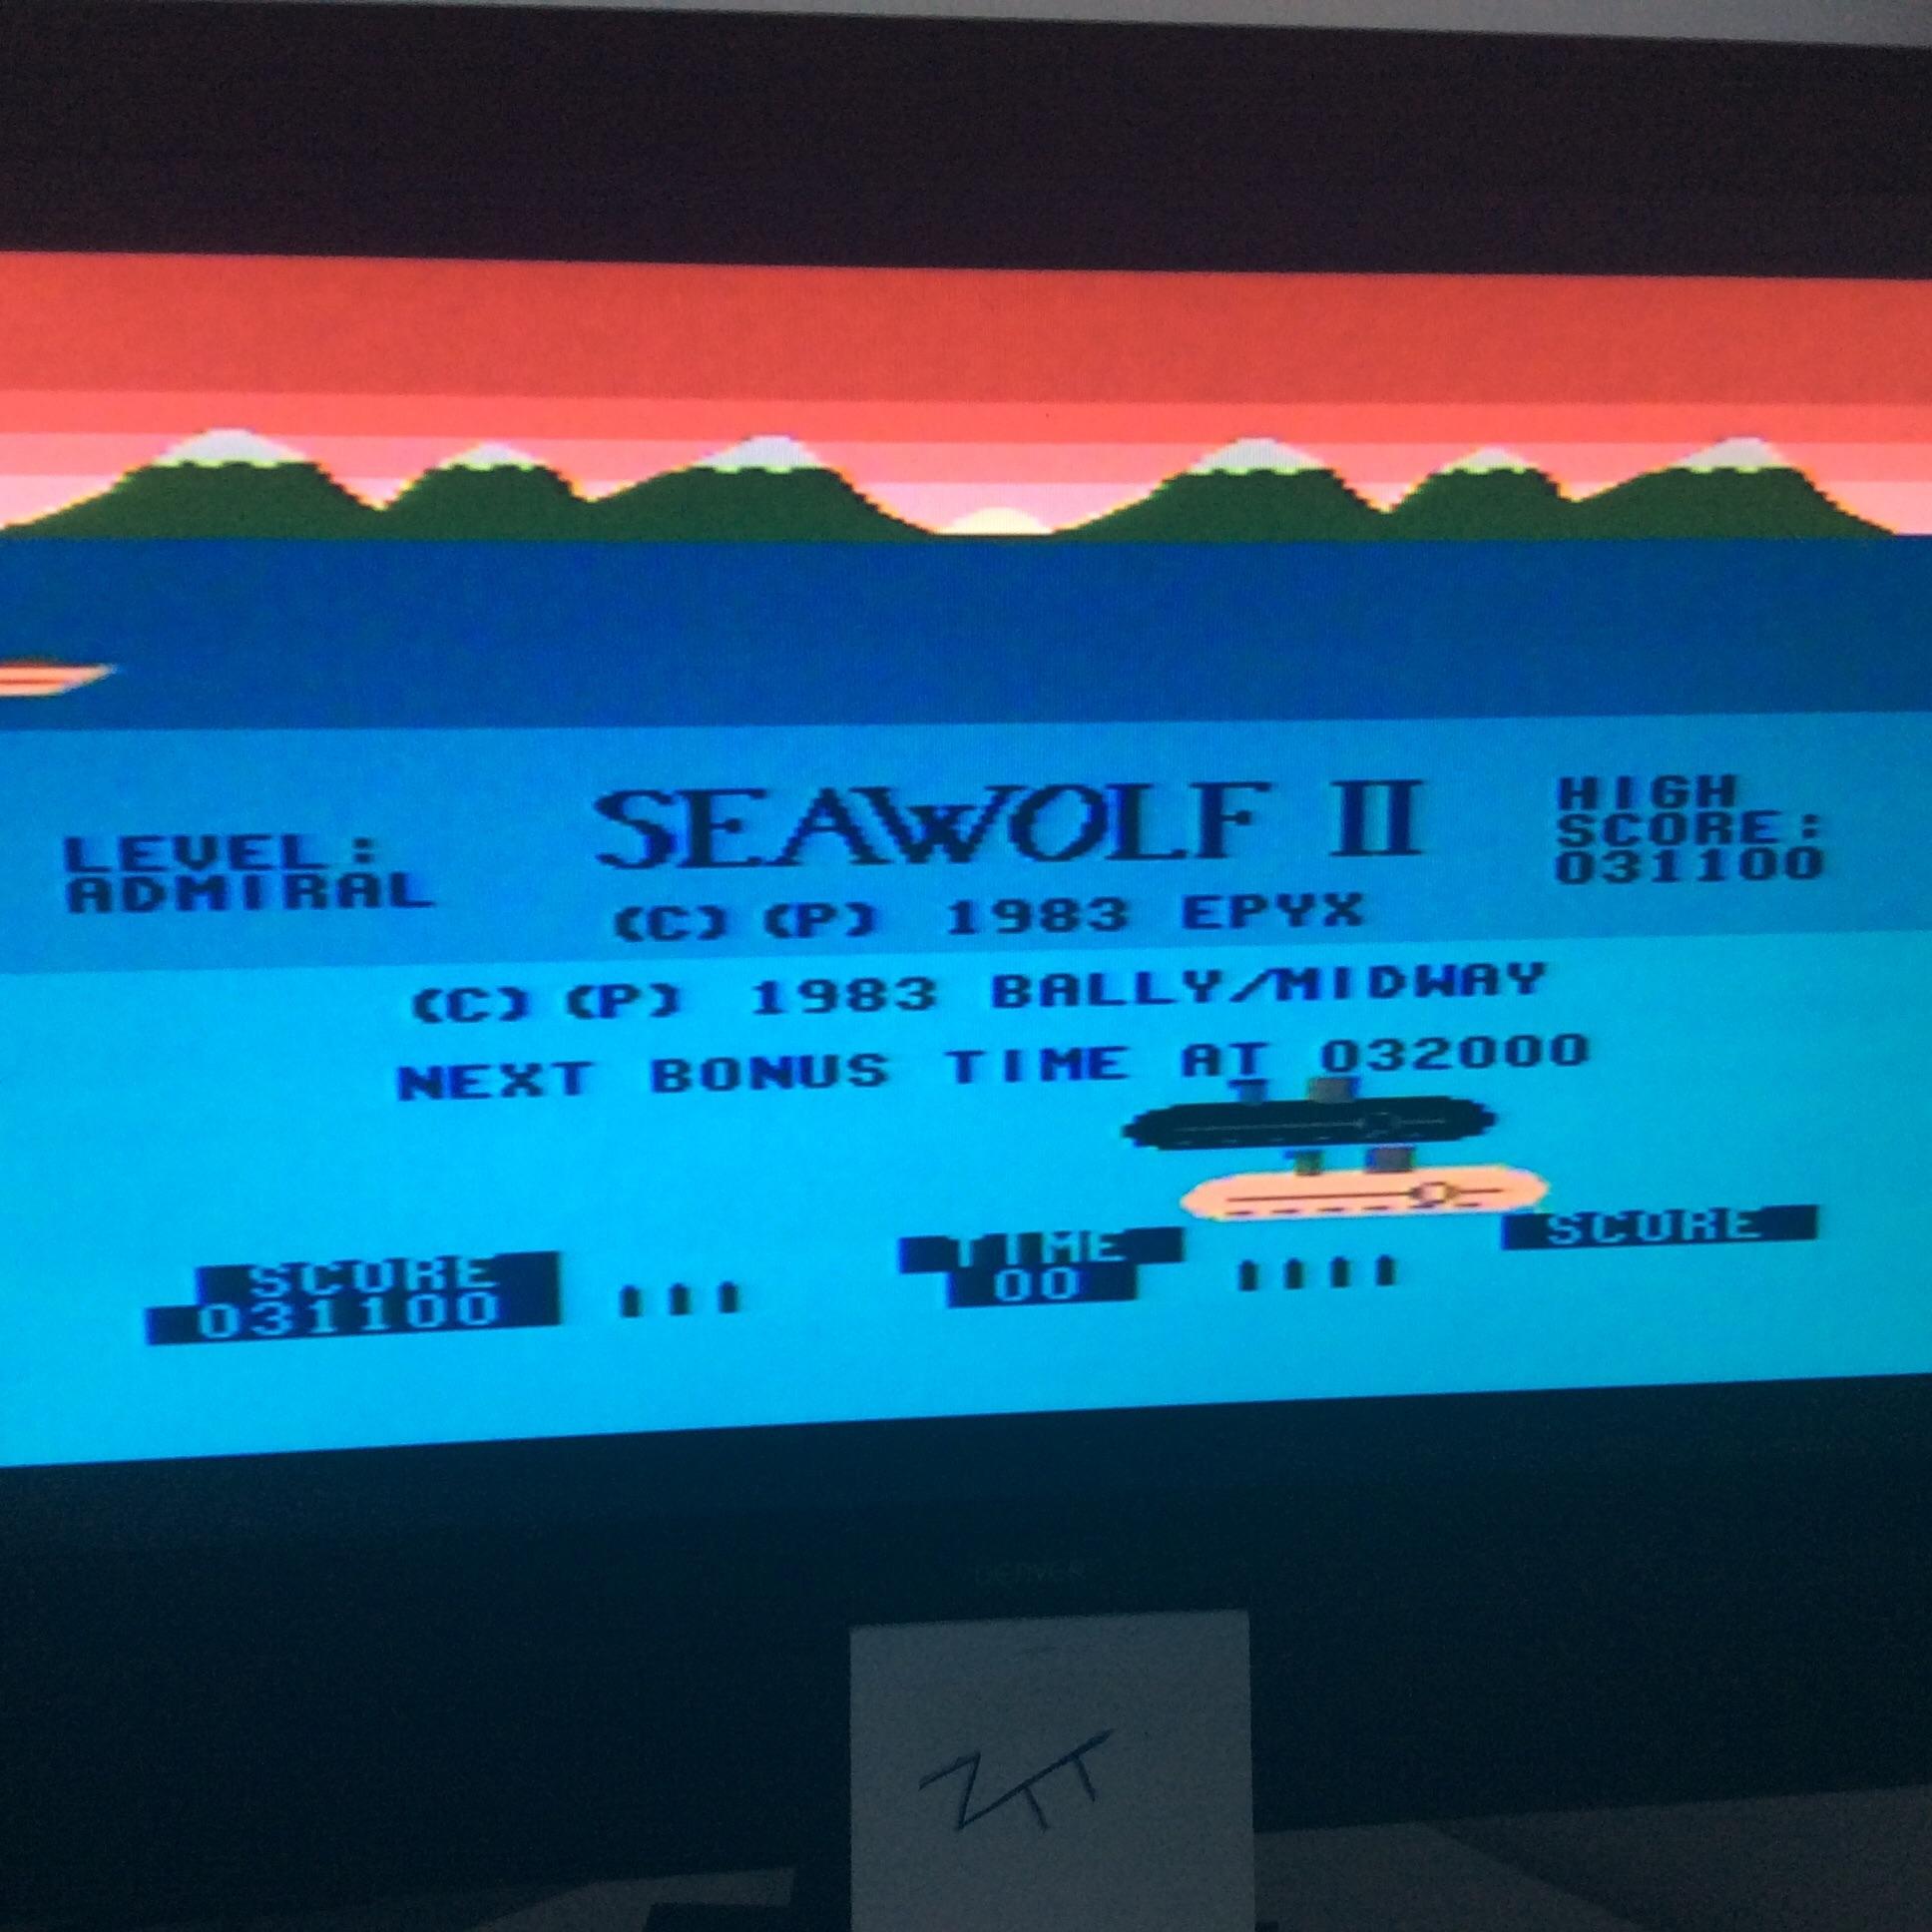 Seawolf II 31,100 points